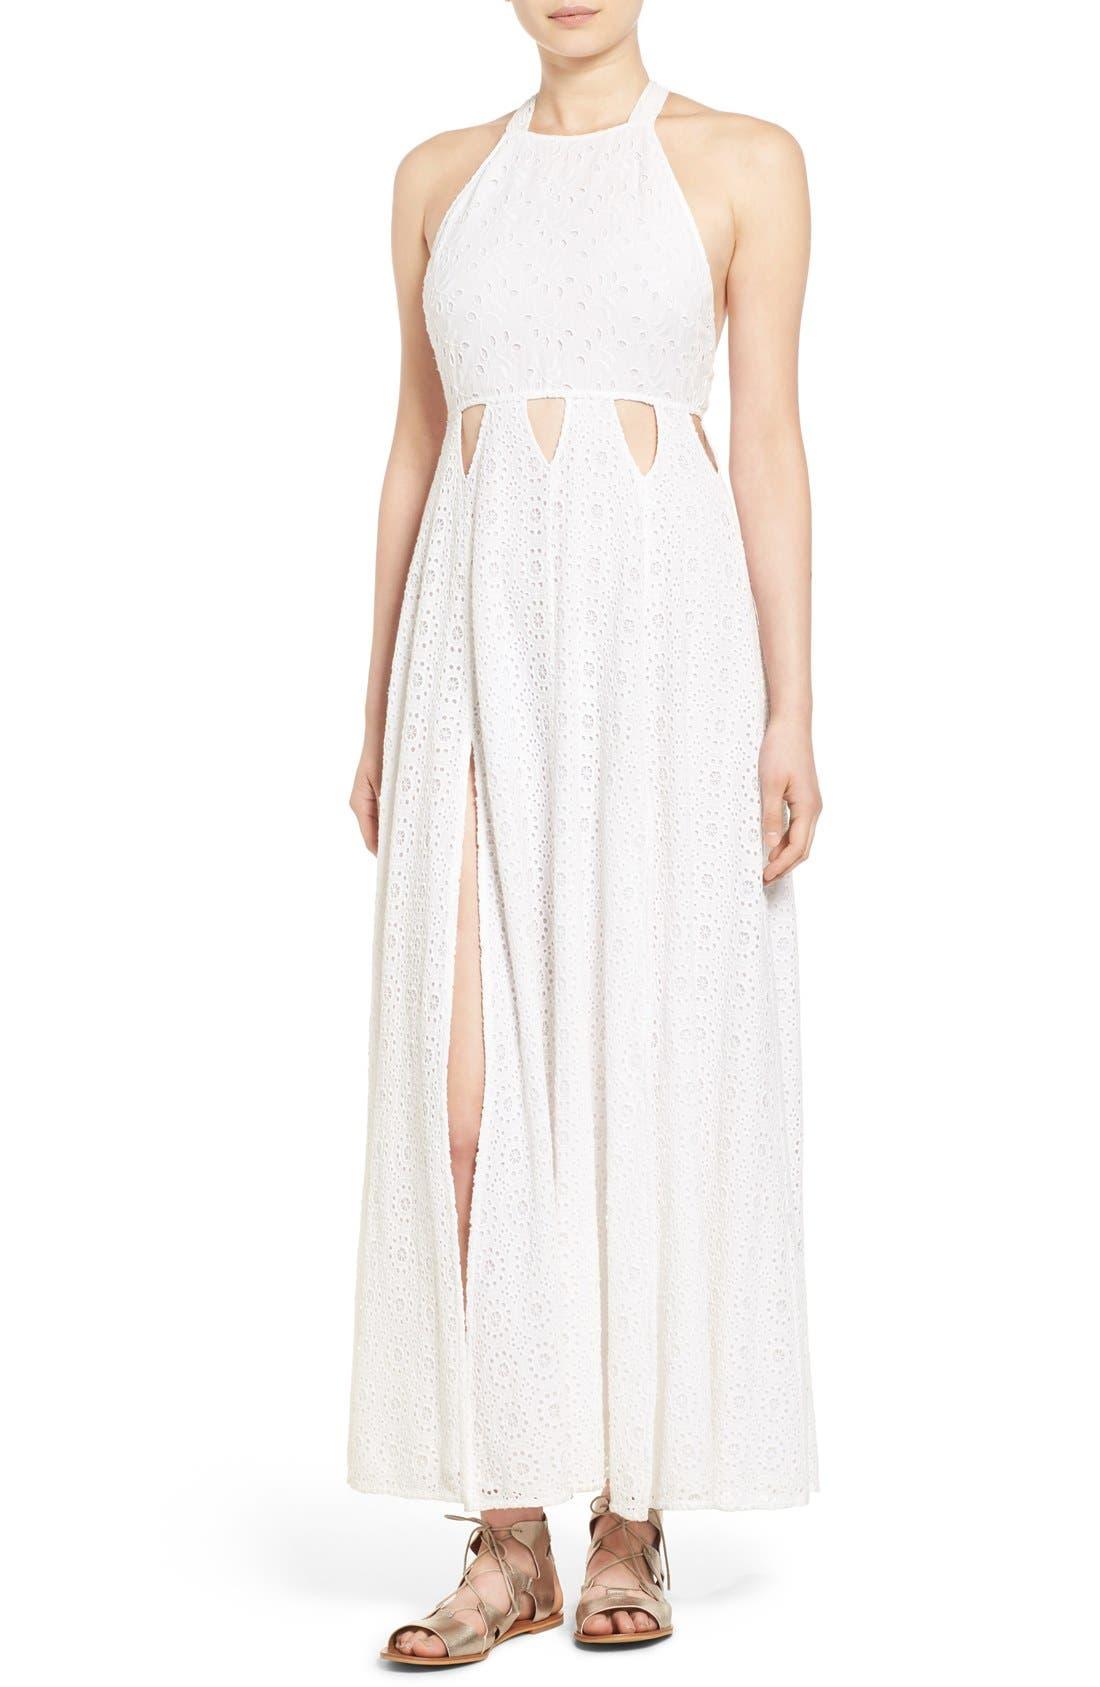 Alternate Image 1 Selected - Tularosa 'Duchess' Cotton Lace Maxi Dress